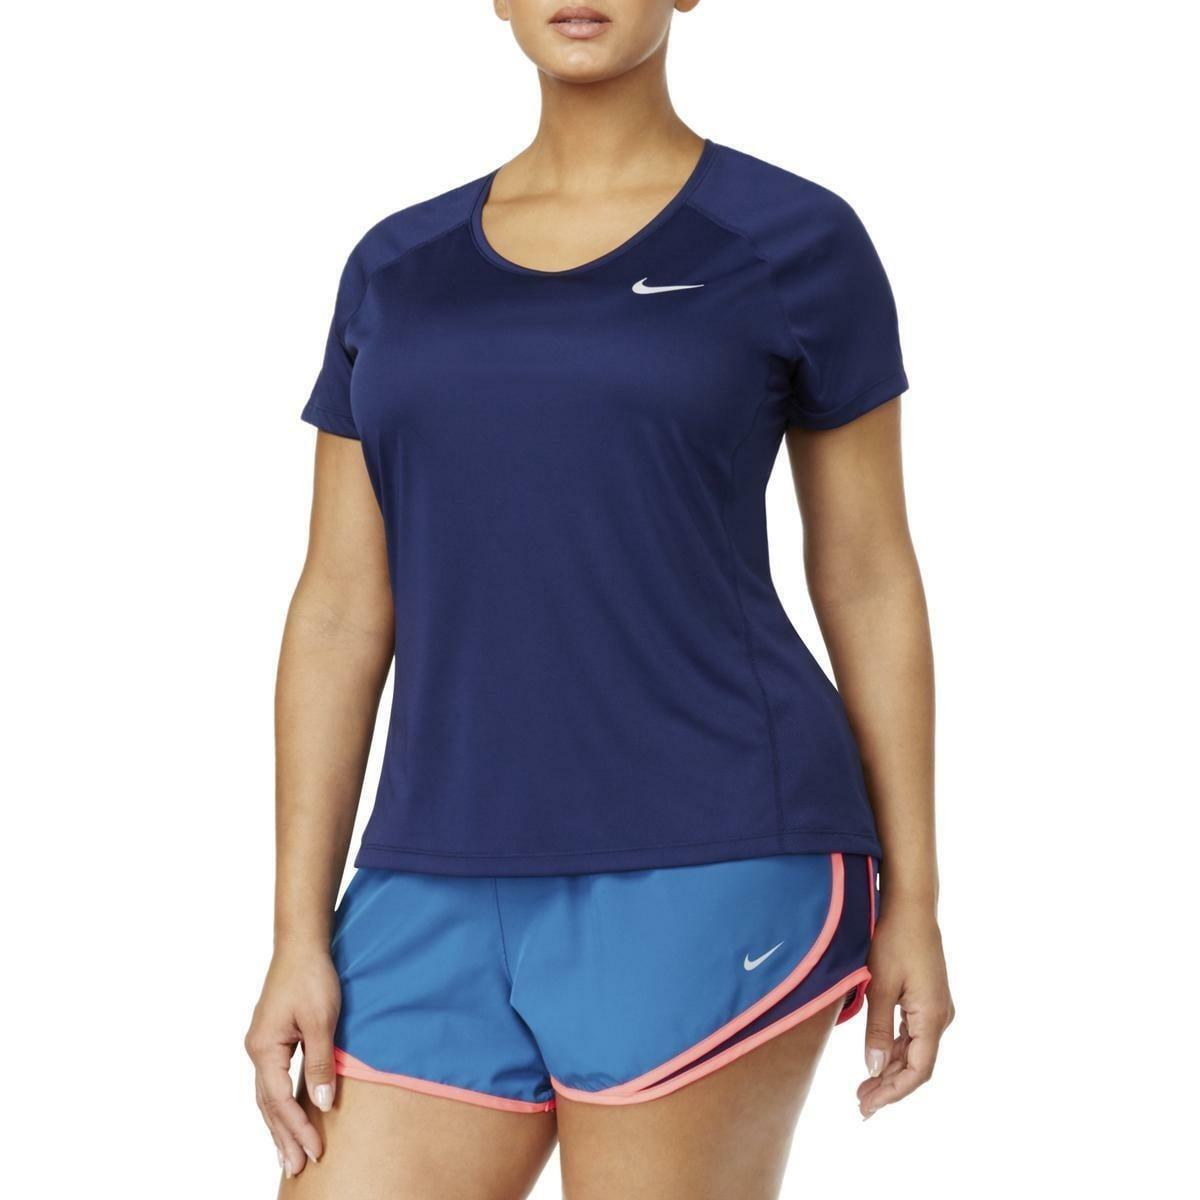 Nike Dry Miler short sleeve running top adult S blue